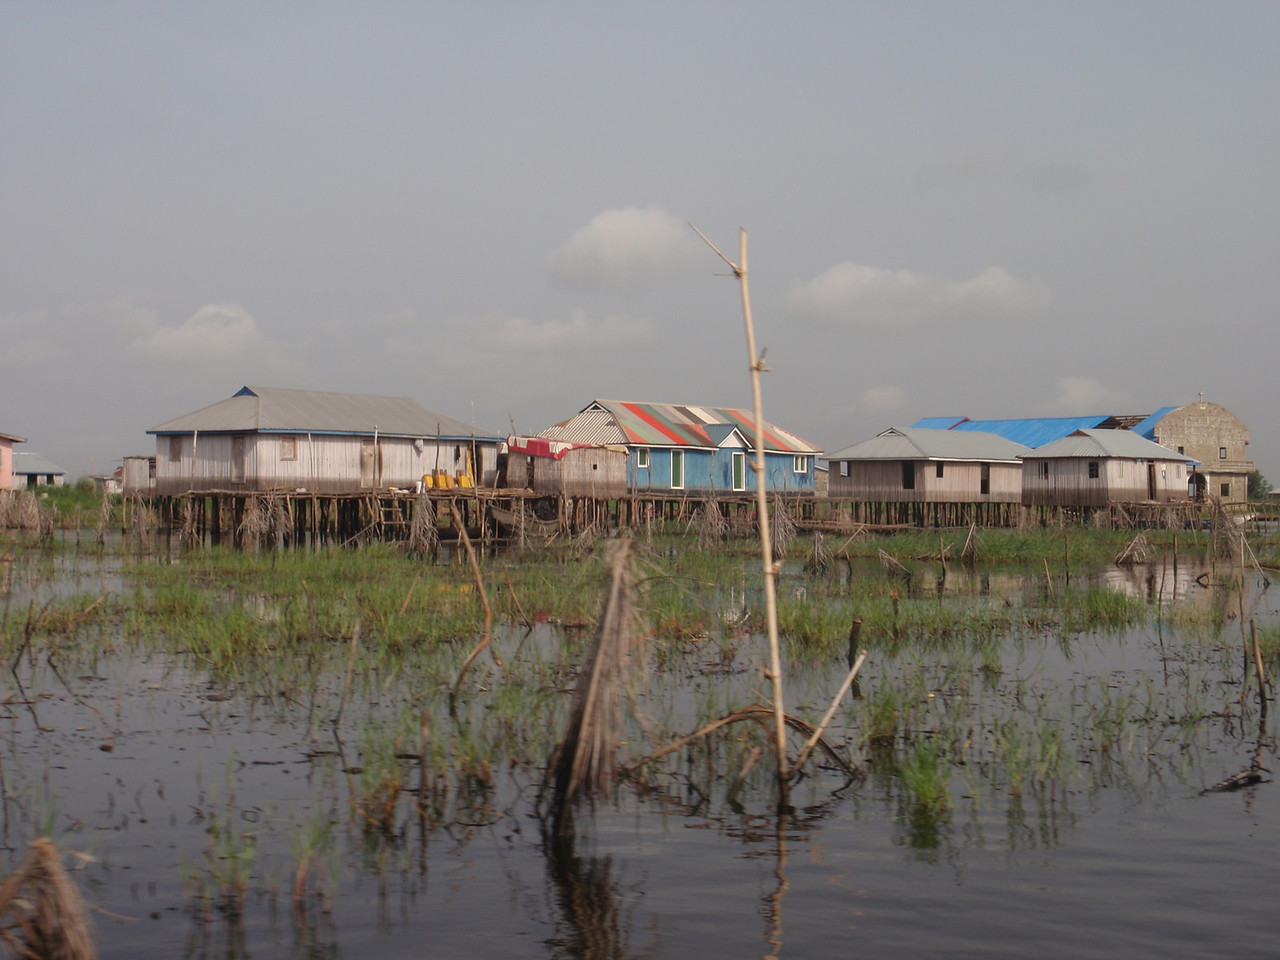 098_Ganvie Lake Community  Lake Nokoue  Tranquil Waterways